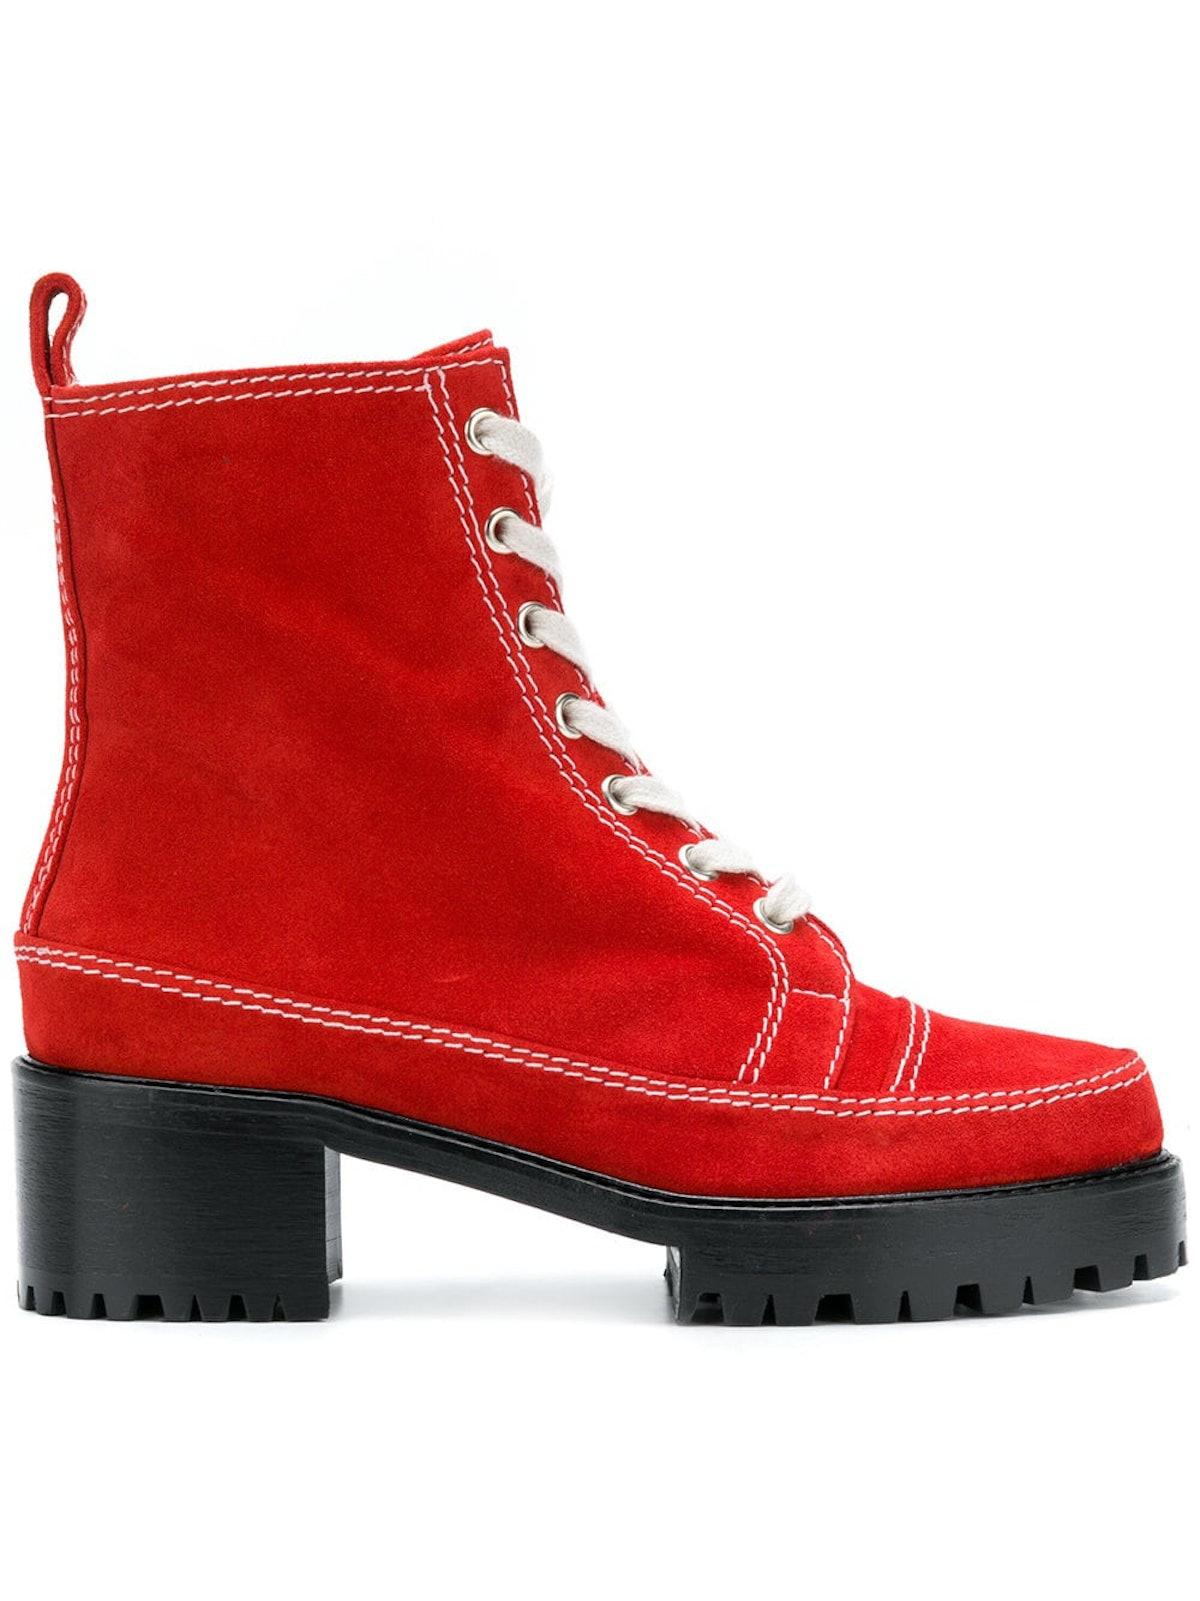 Chris Boots